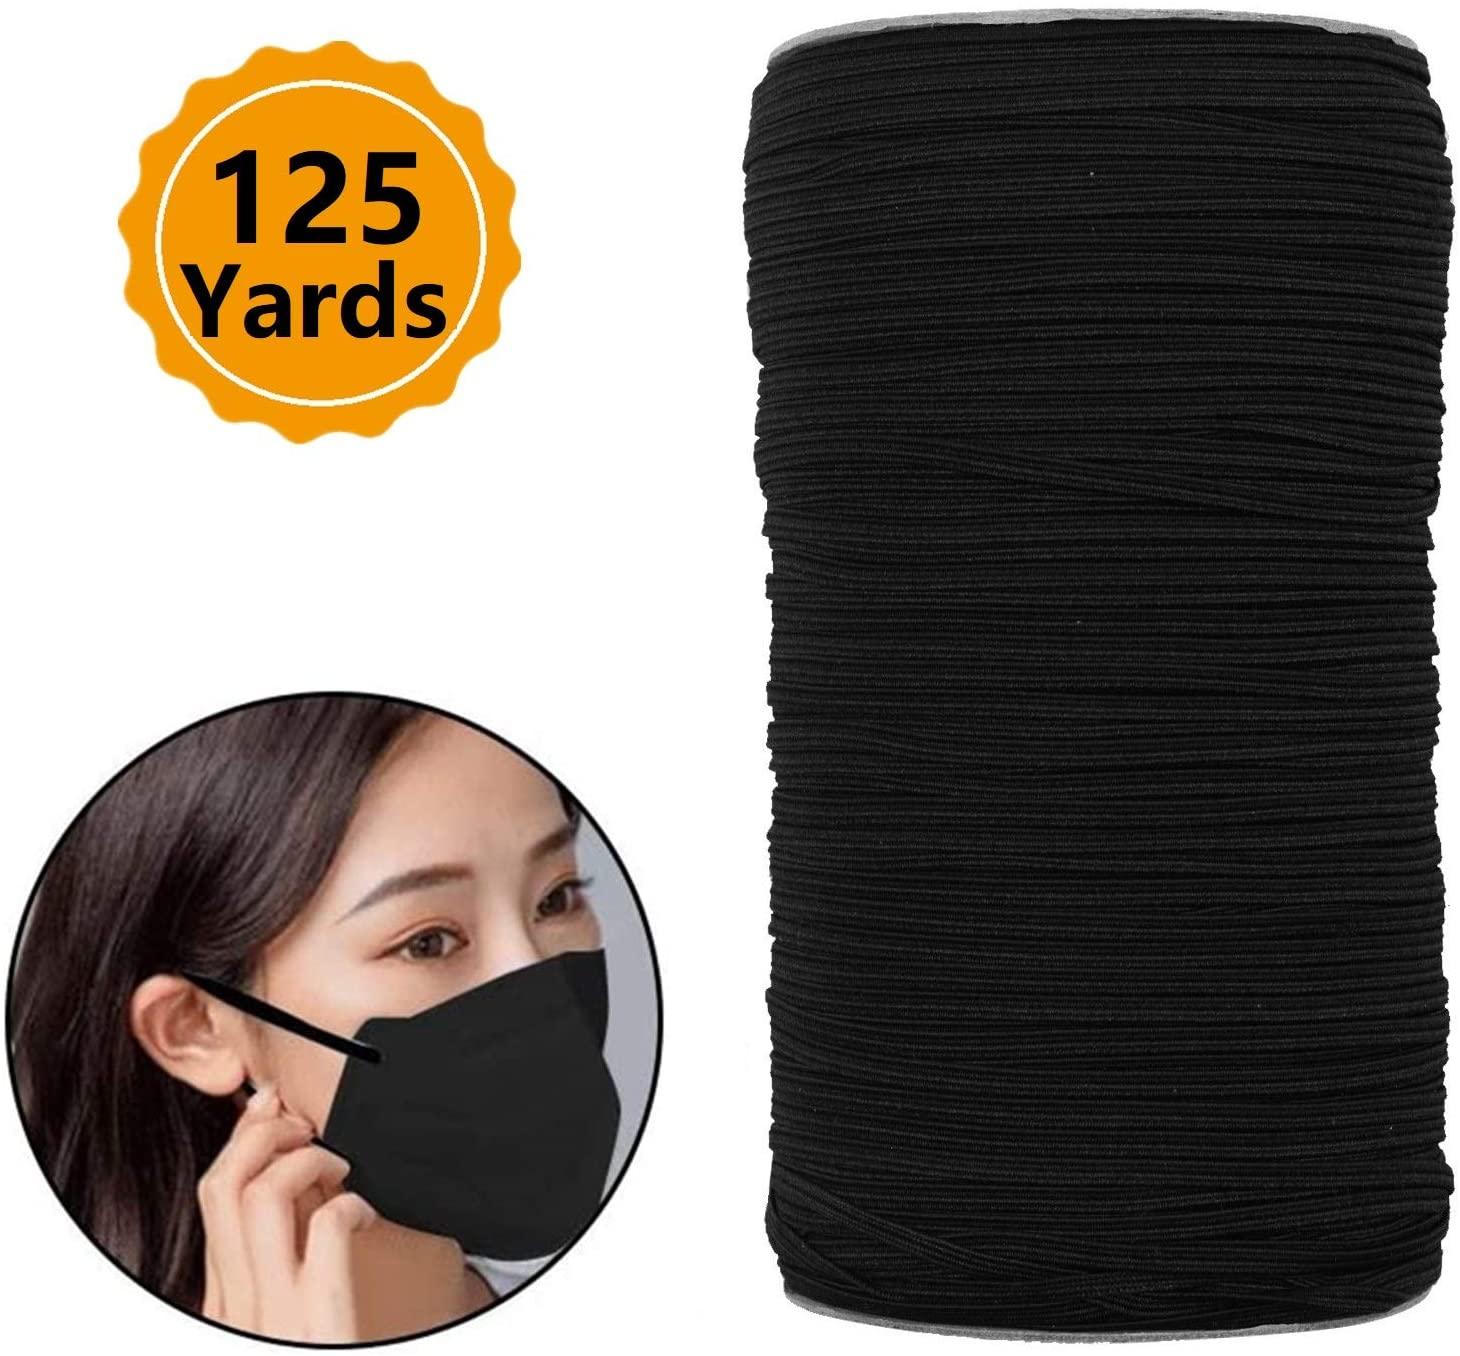 Braided Elastic Band Black 125 Yards Length 3mm Width Elastic Rope Elastic Cord Heavy Stretch High Elasticity Knit Elastic Band for Sewing Crafts DIY Bedspread Cuff